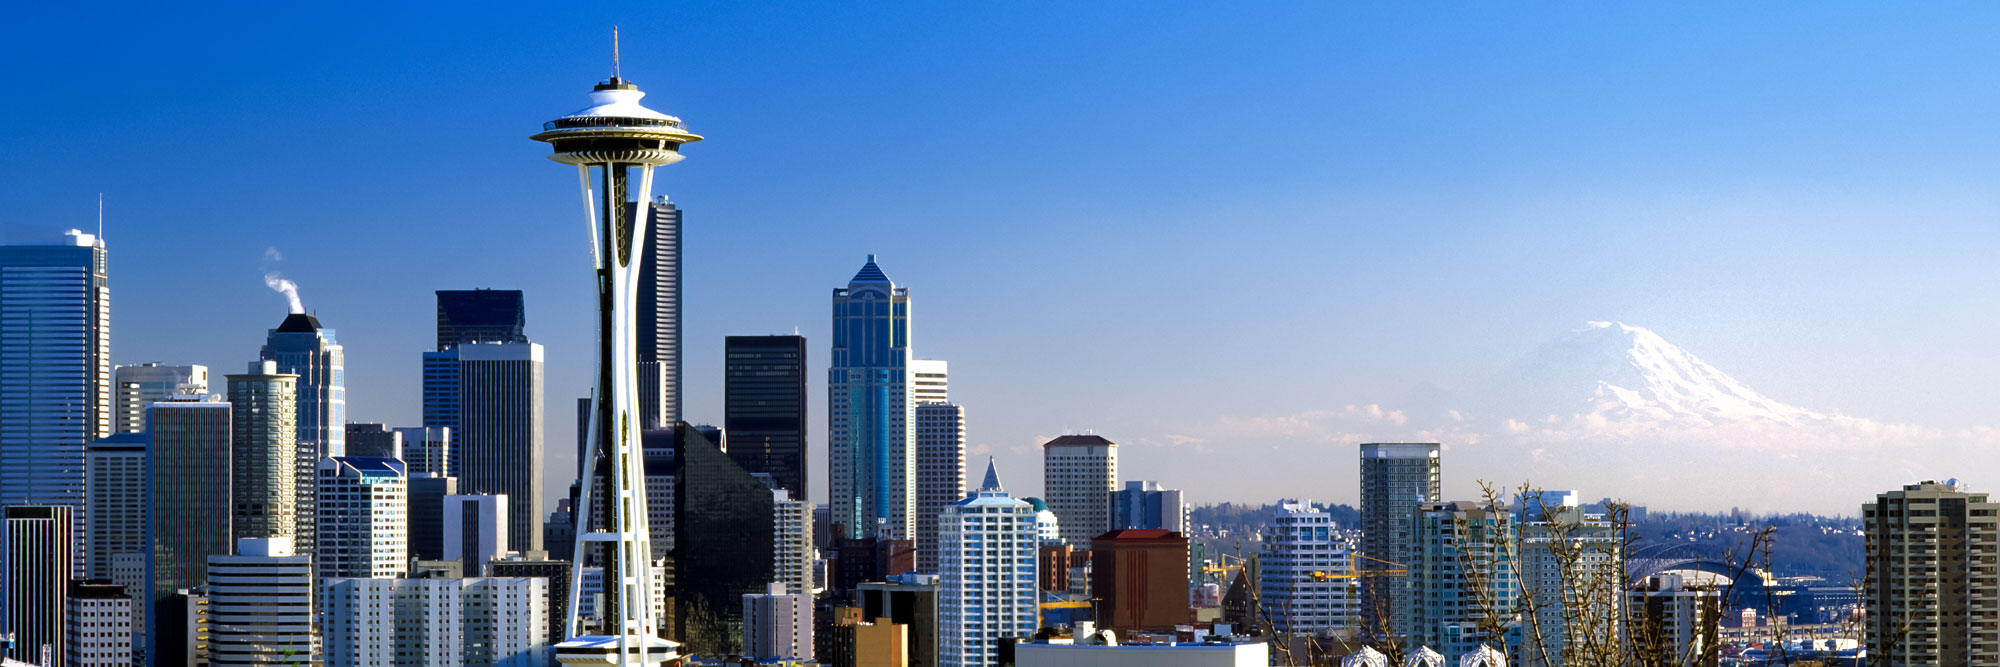 MHMlocationPageHeader-Seattle.jpg